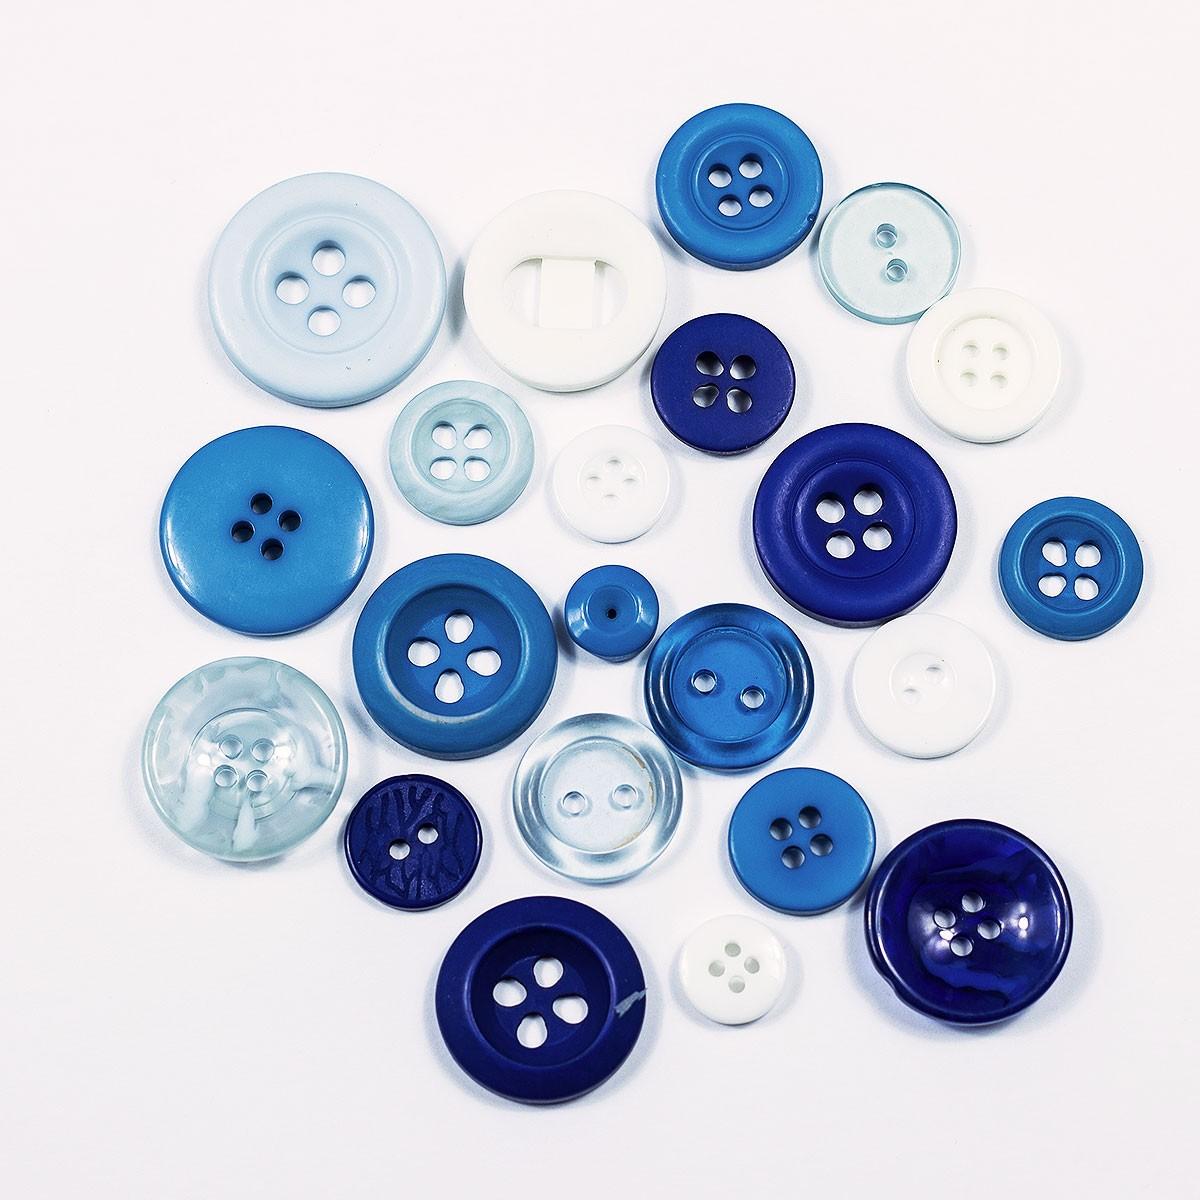 Kit Botões Sortidos Coloridos pacote c/ 100g Círculo S/A